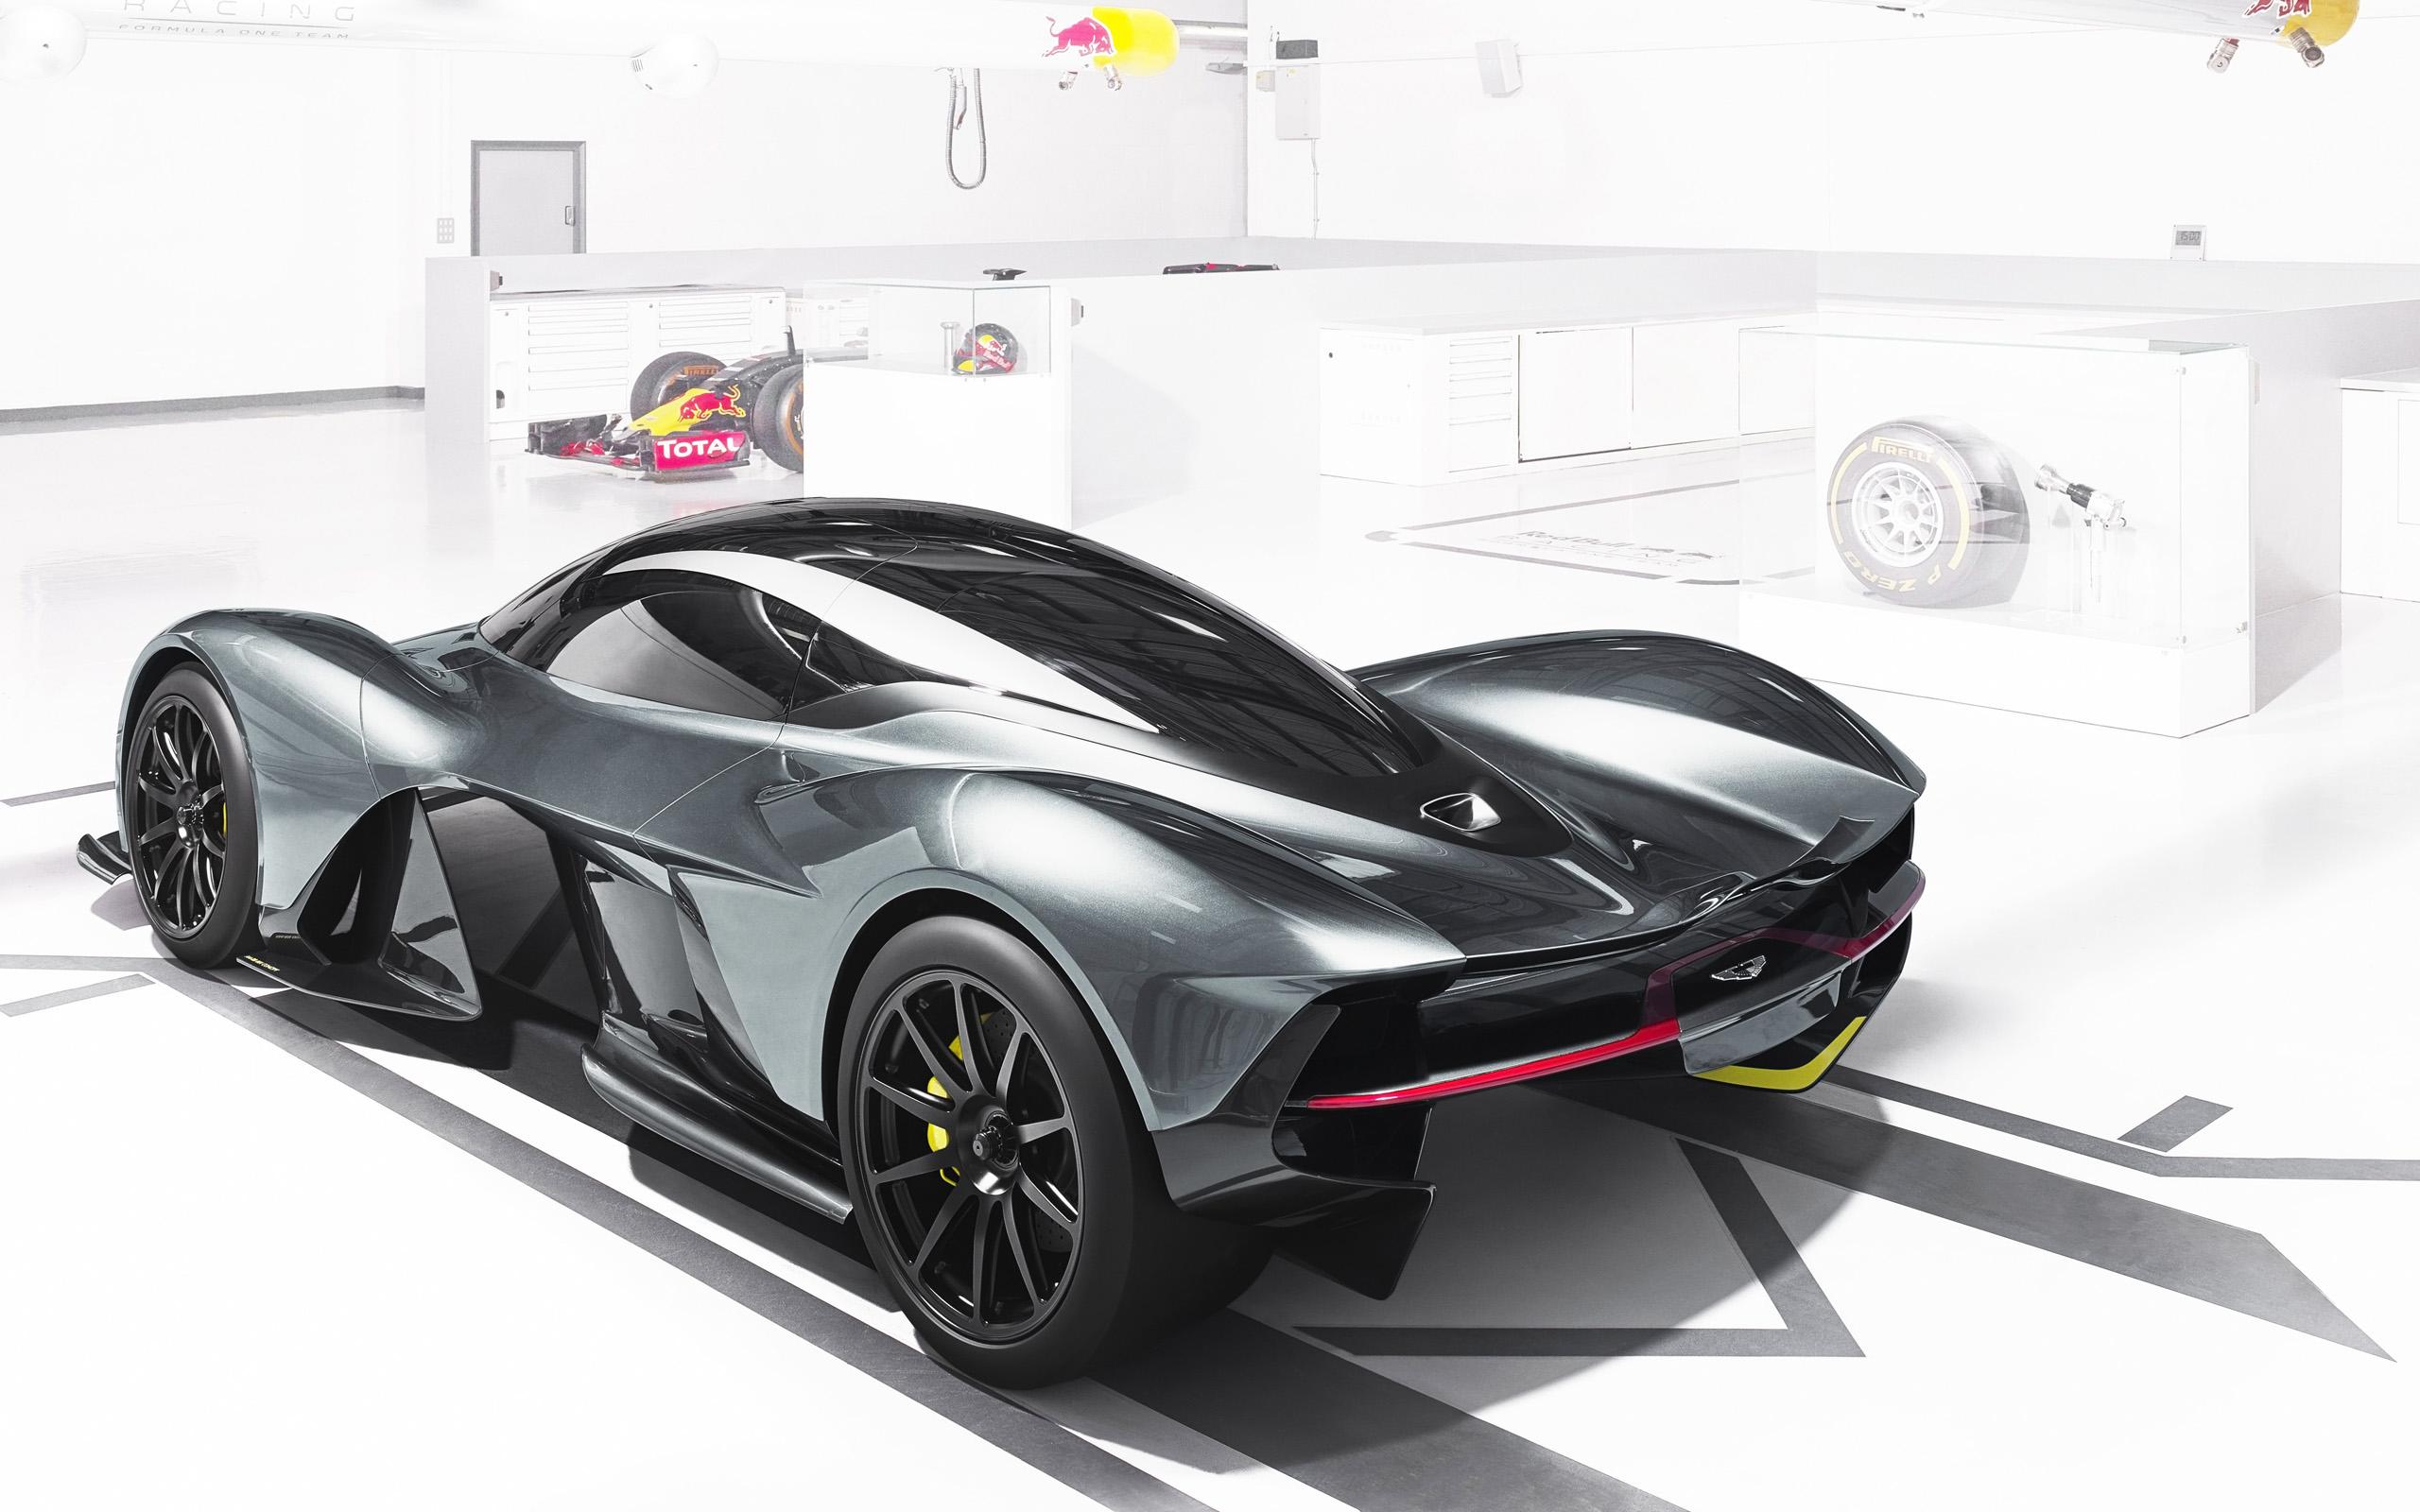 2018 Aston Martin Red Bull Am Rb 3 Wallpaper Hd Car Wallpapers